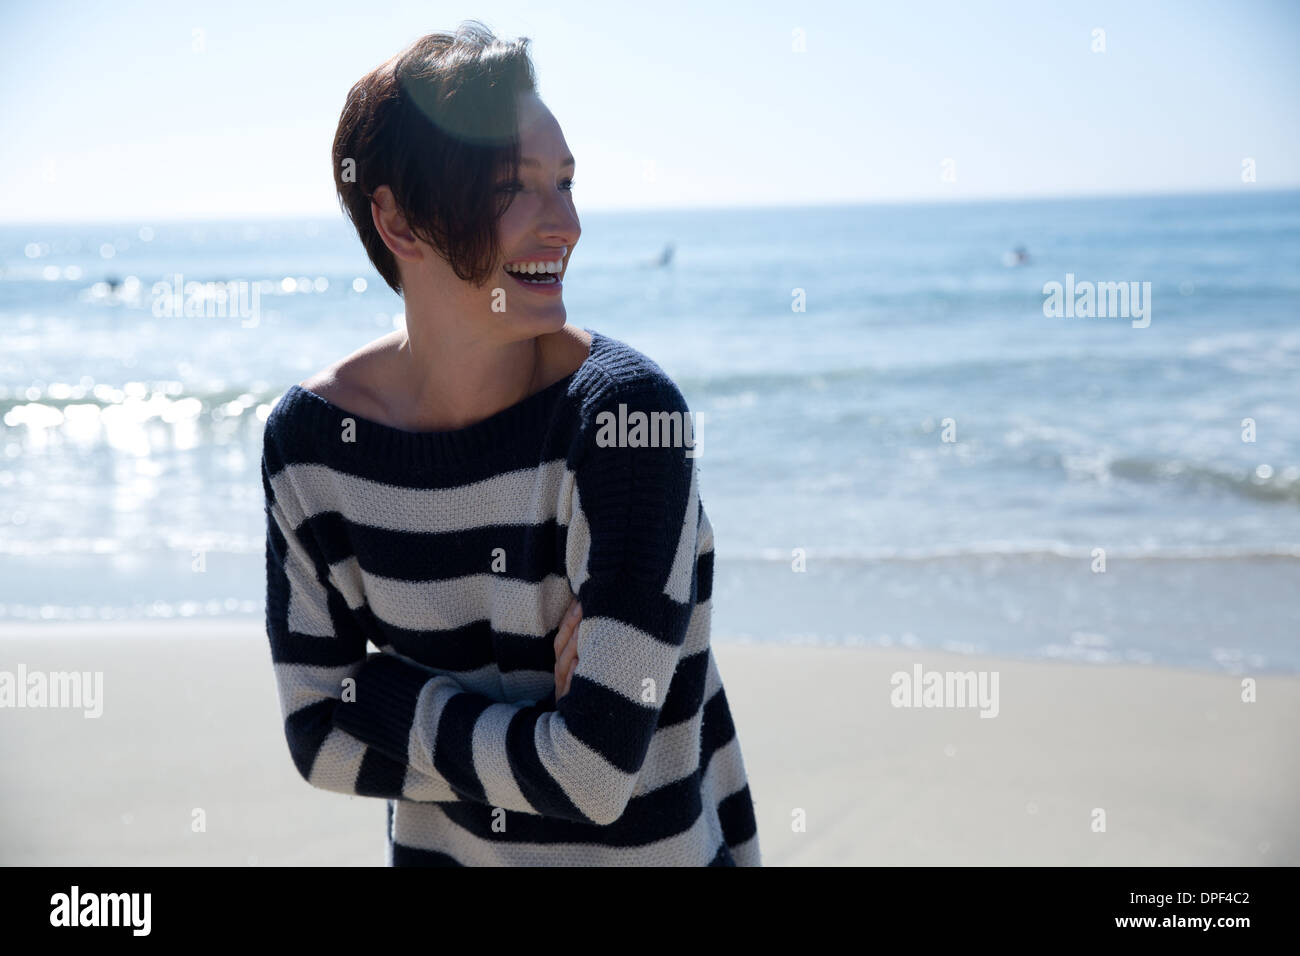 Mature woman wearing striped top, Newport Beach, California, USA - Stock Image